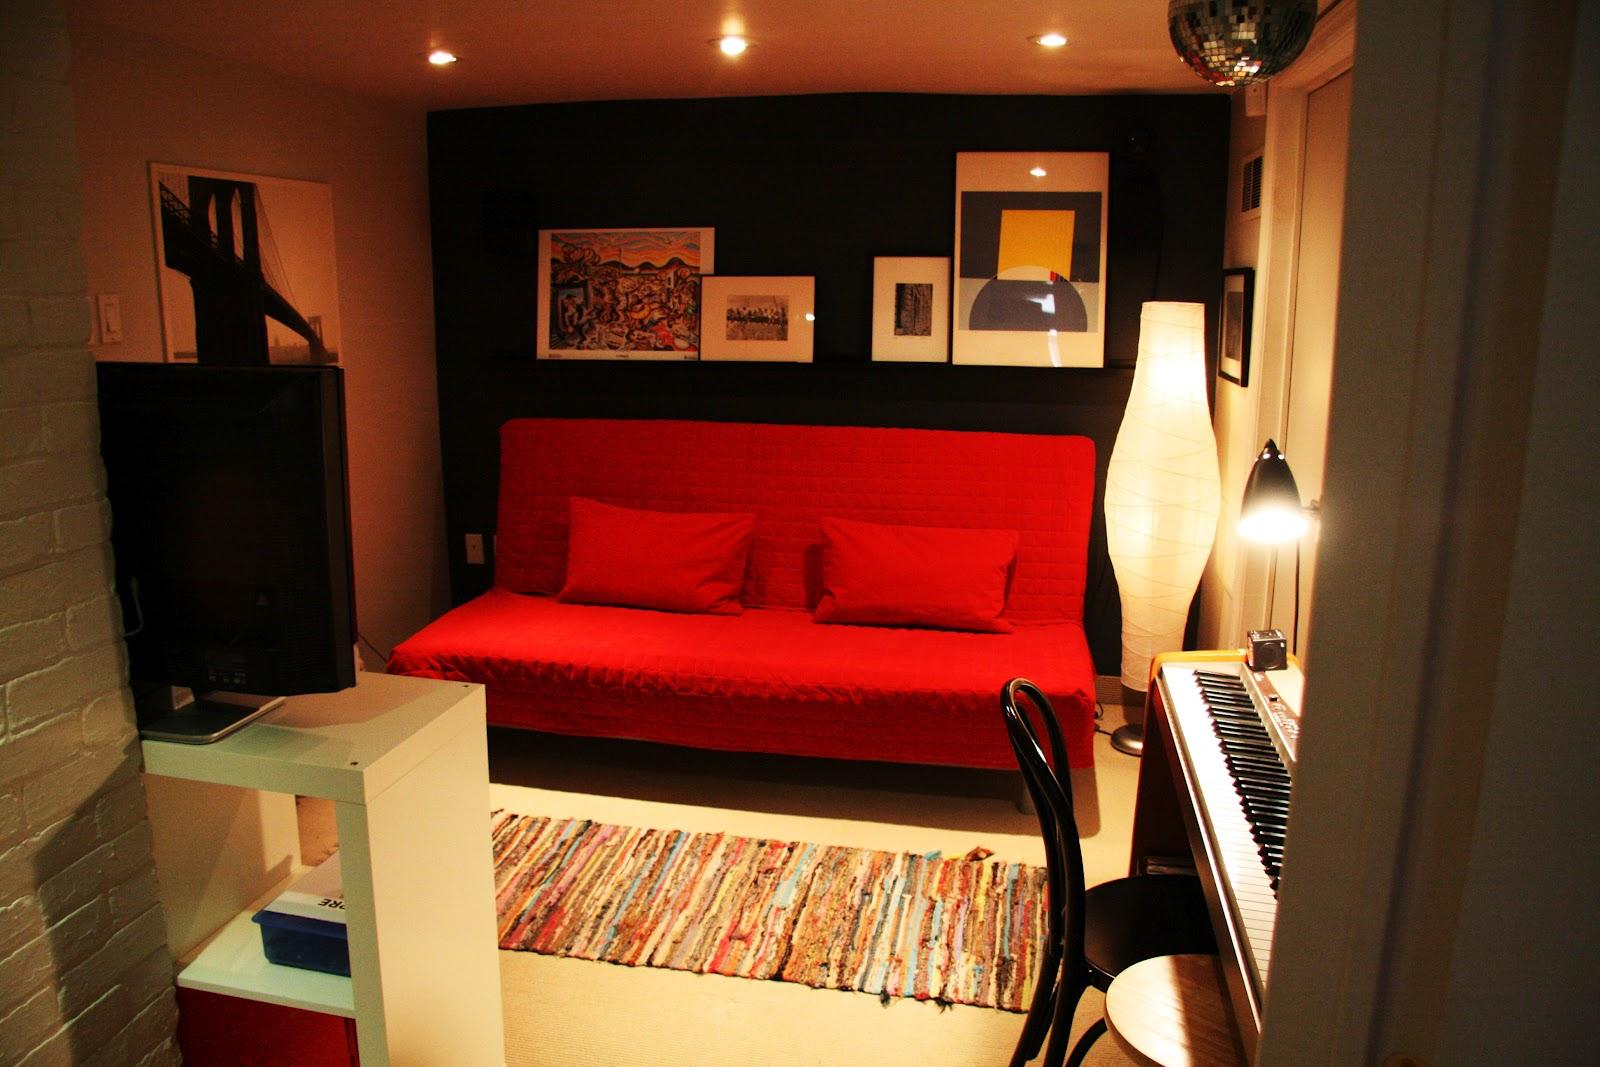 Ikea Sofa Bed Design to Invite More Chance to Sleep ...